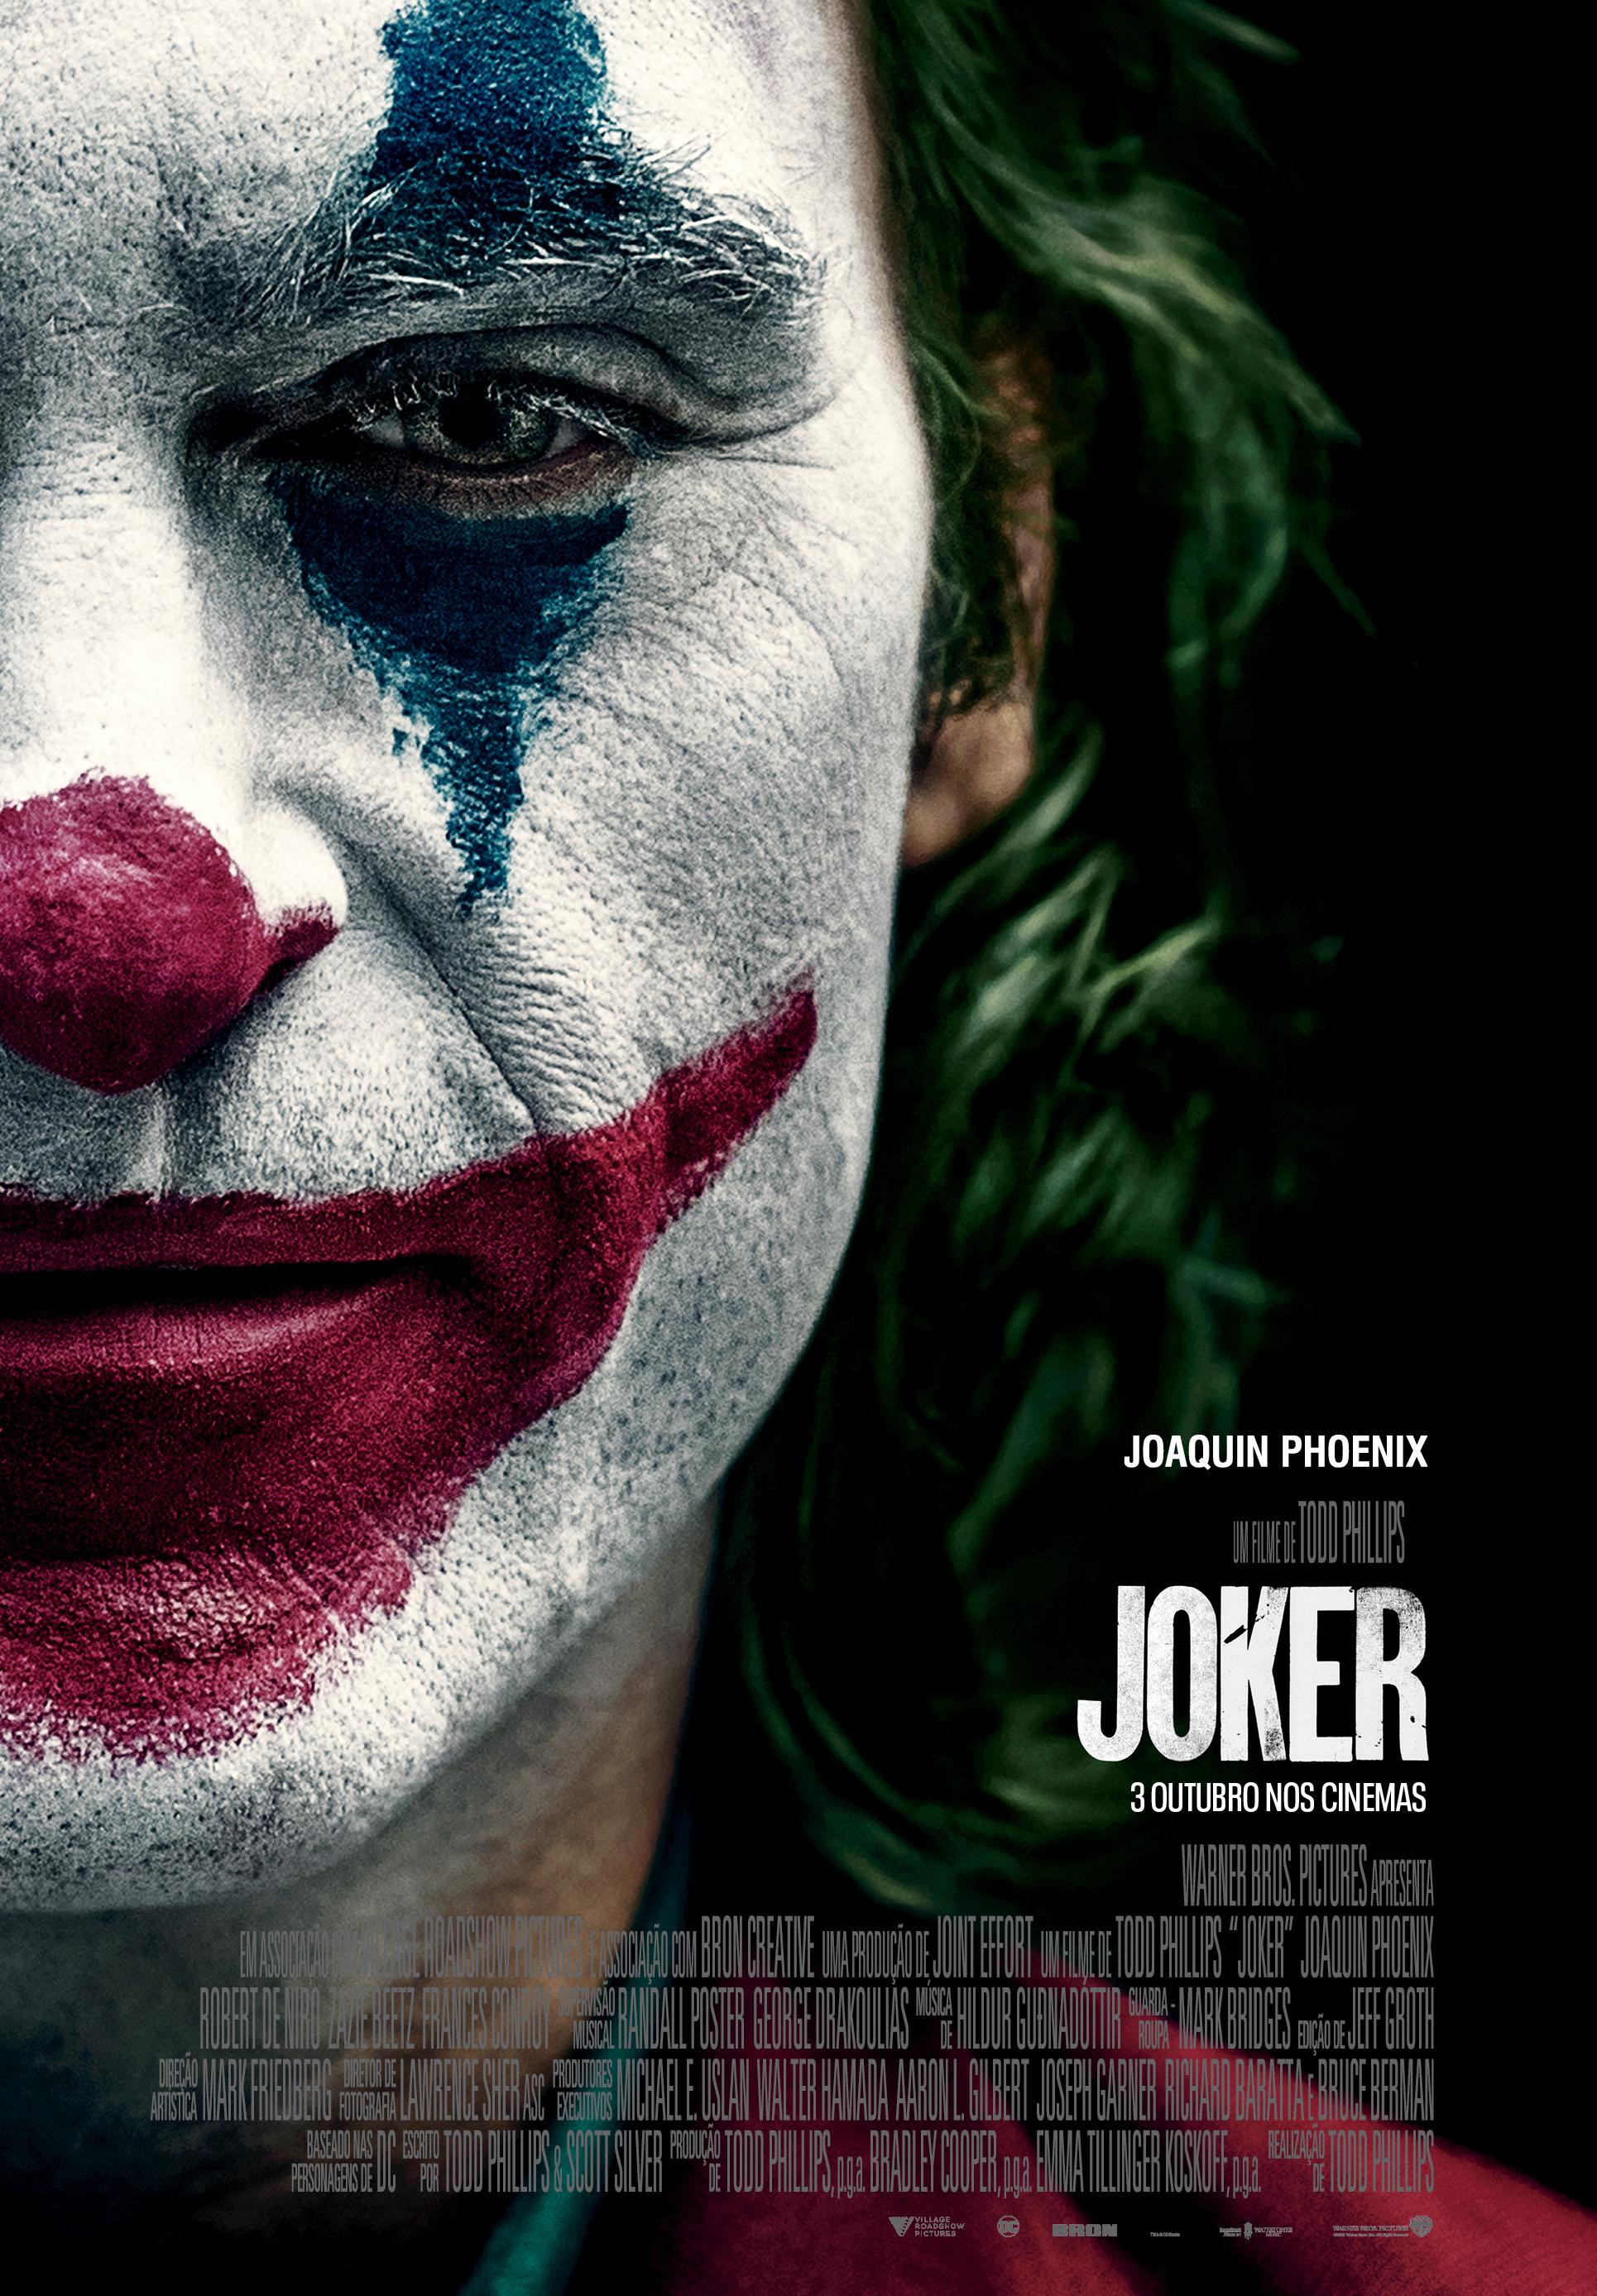 Jocker